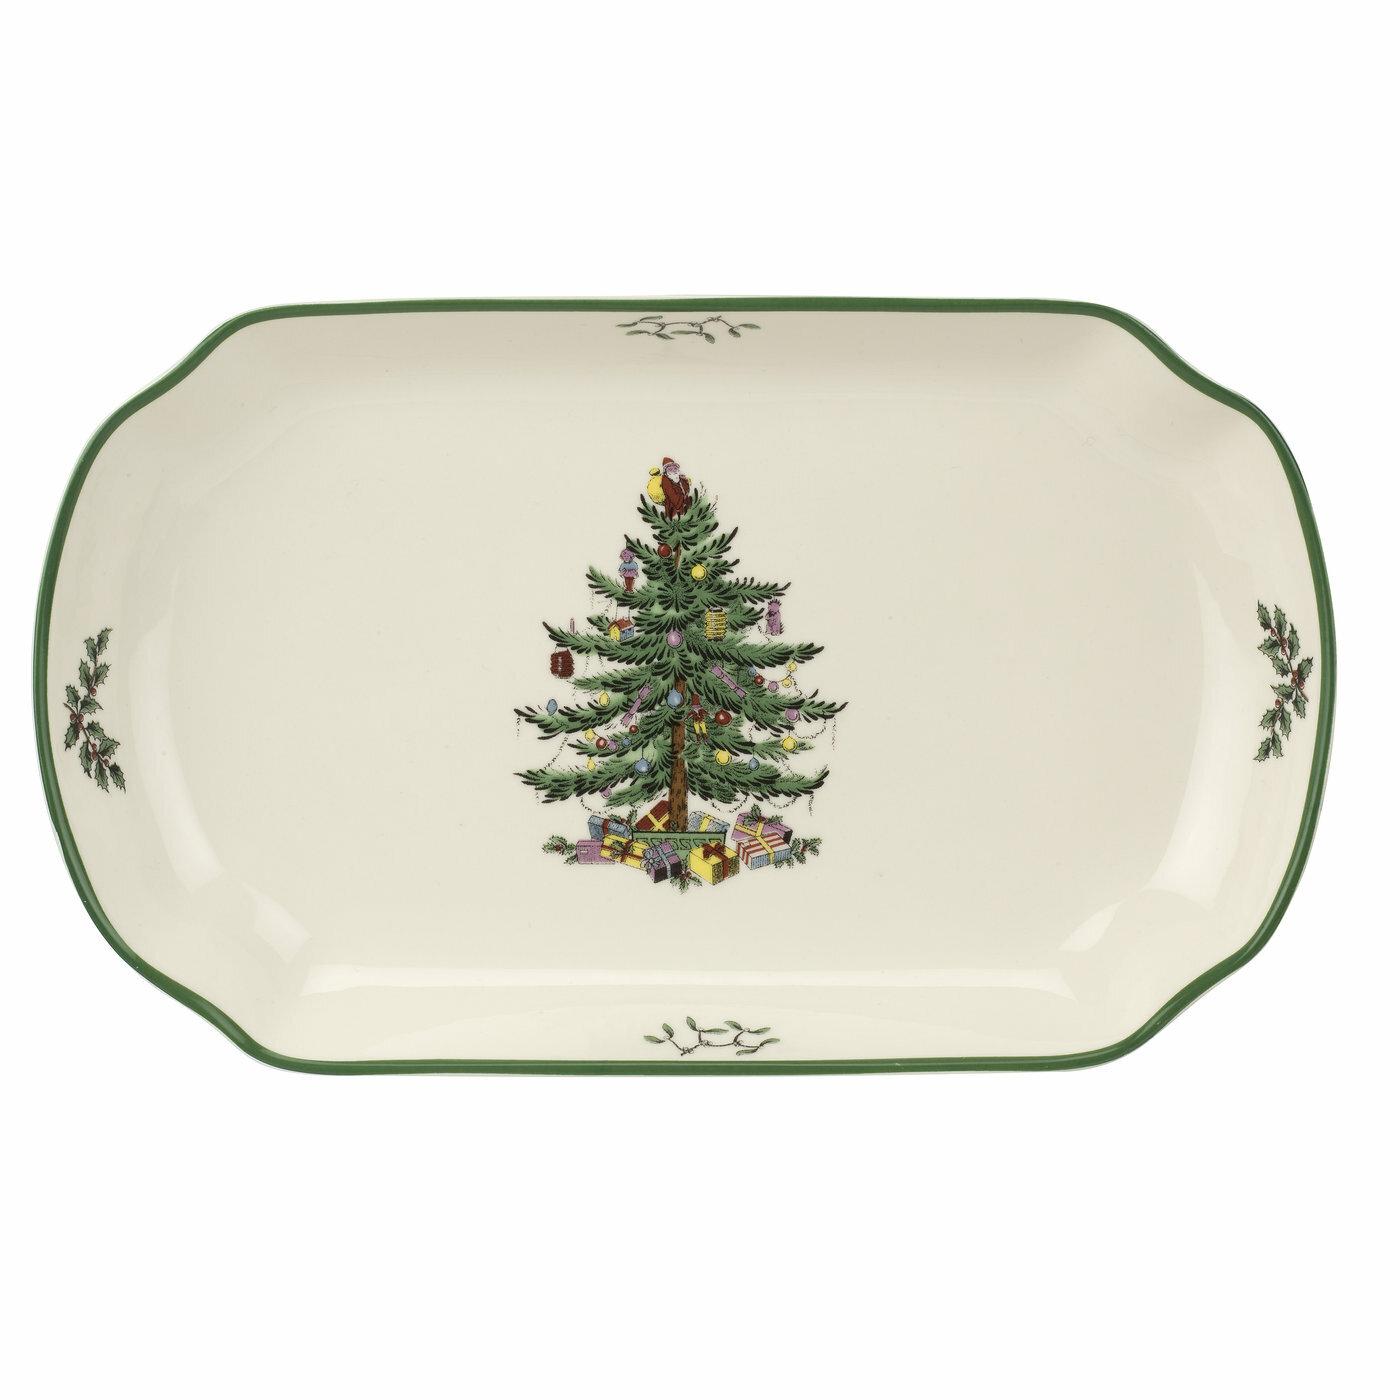 Spode Christmas Plates.Spode Christmas Tree Rectangular Scalloped Tray